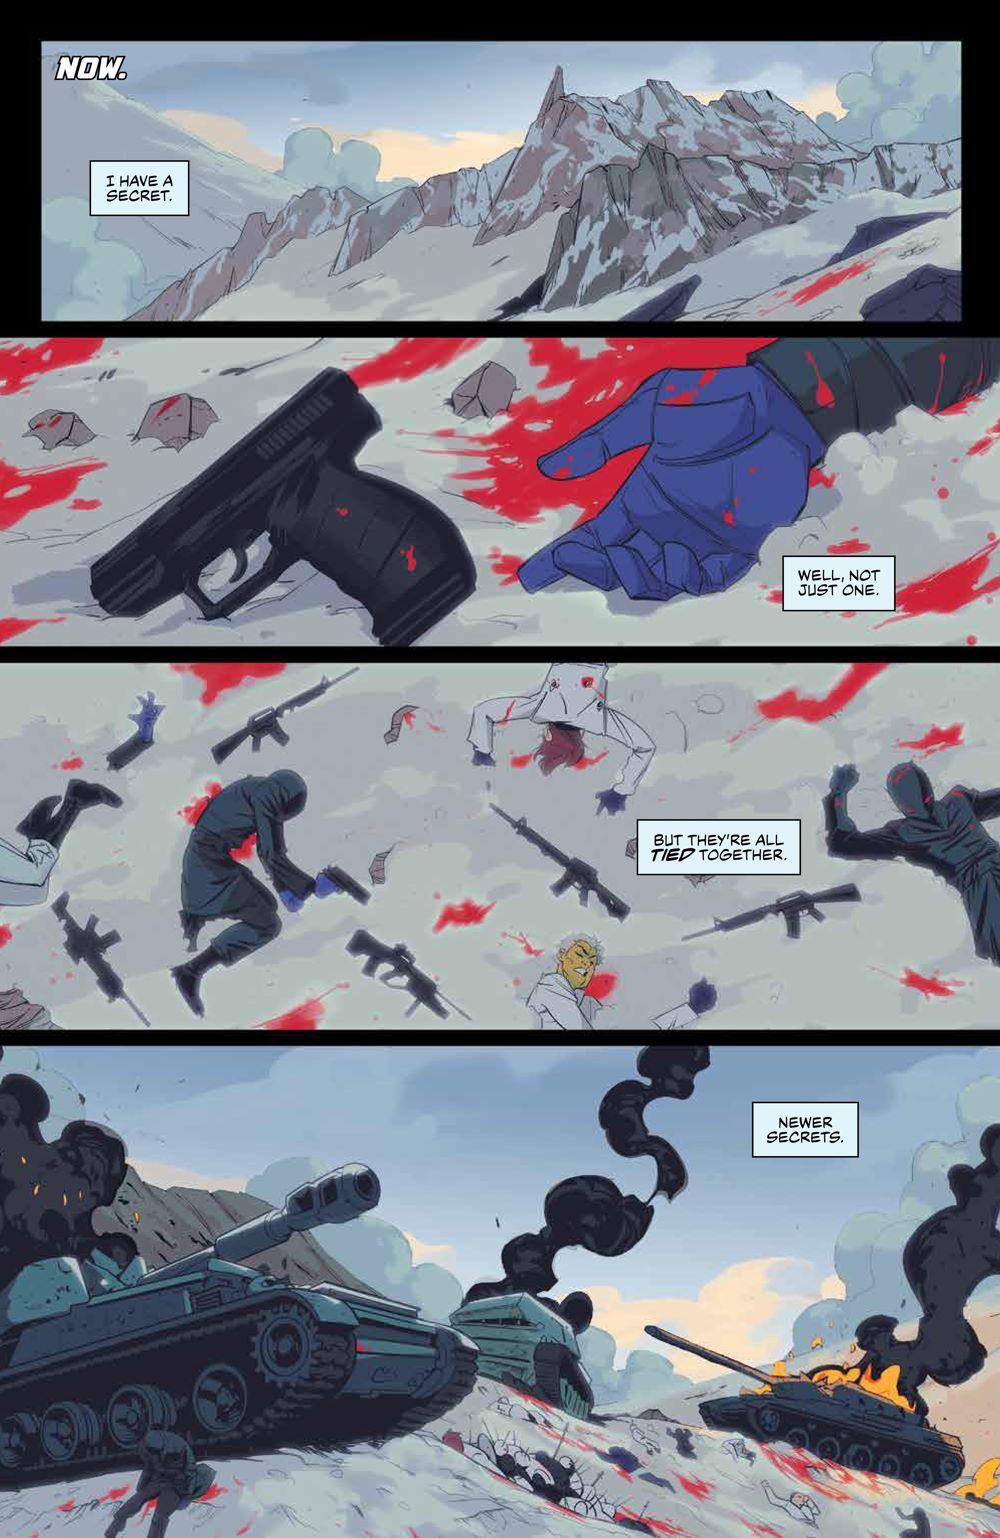 SevenSecrets_v1_SC_PRESS_7 ComicList Previews: SEVEN SECRETS VOLUME 1 TP